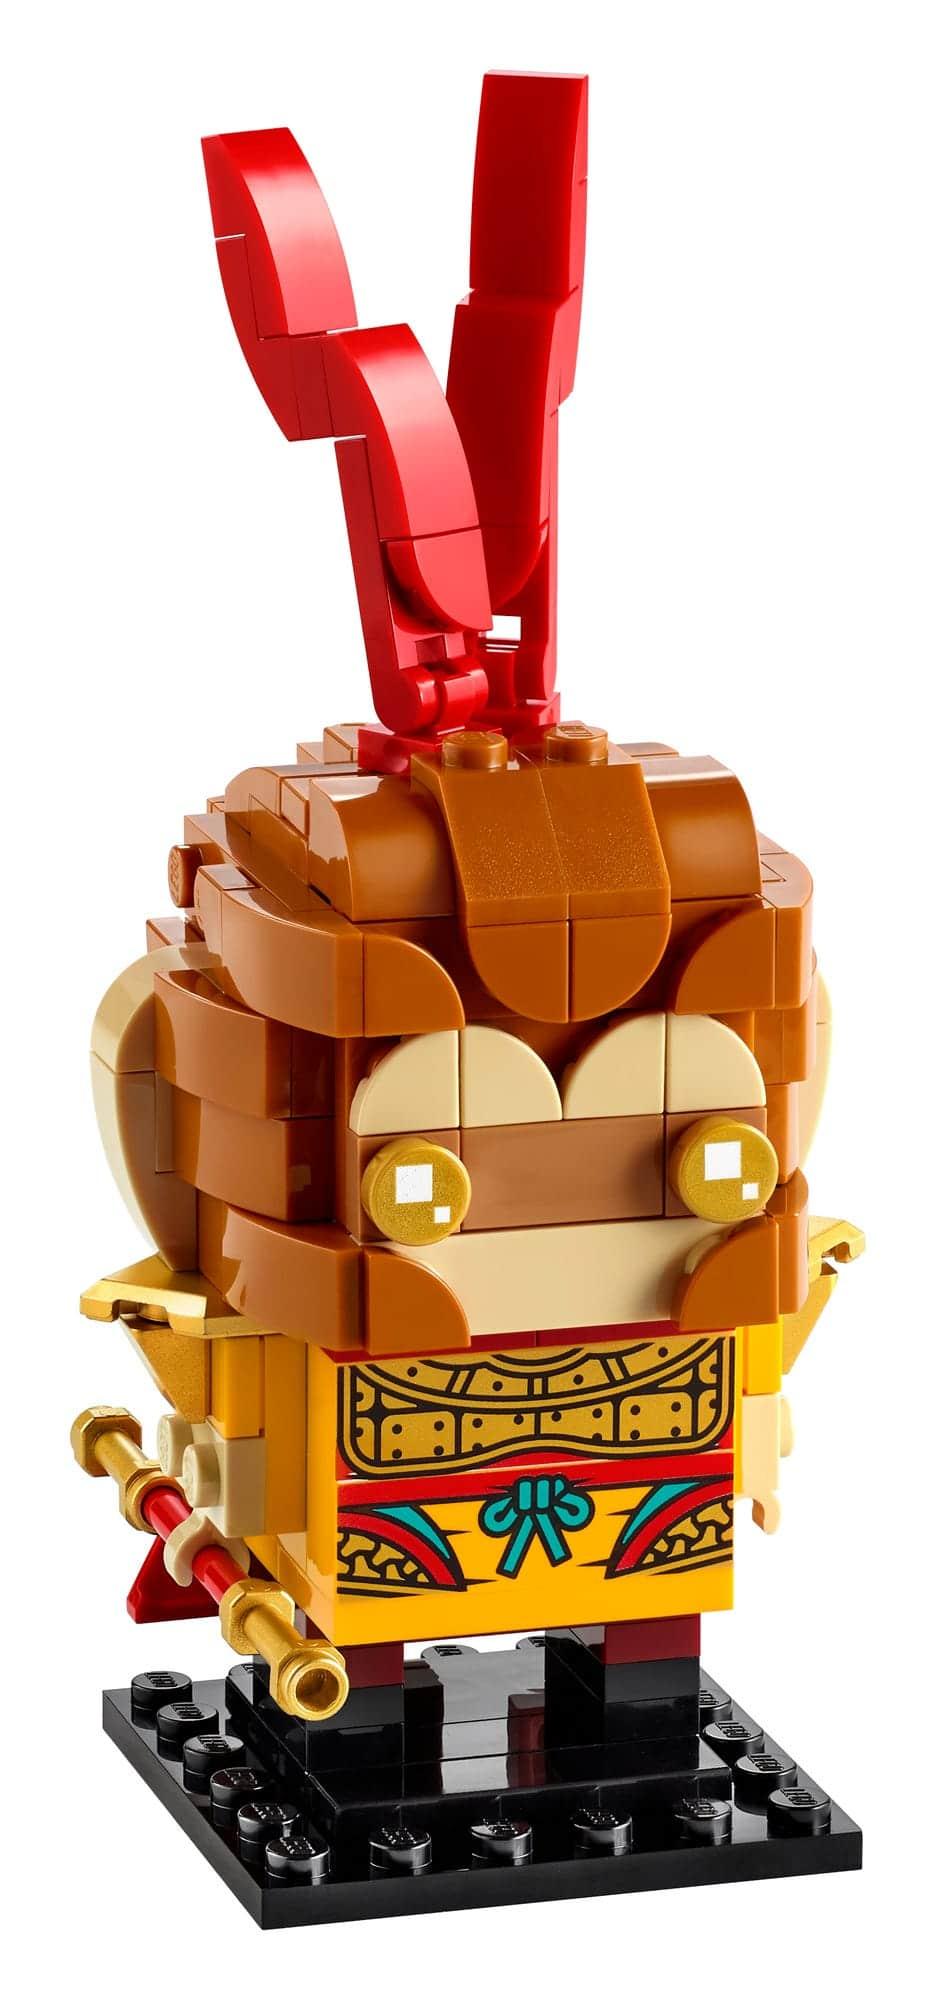 LEGO 40381 Brickheadz Monkey King